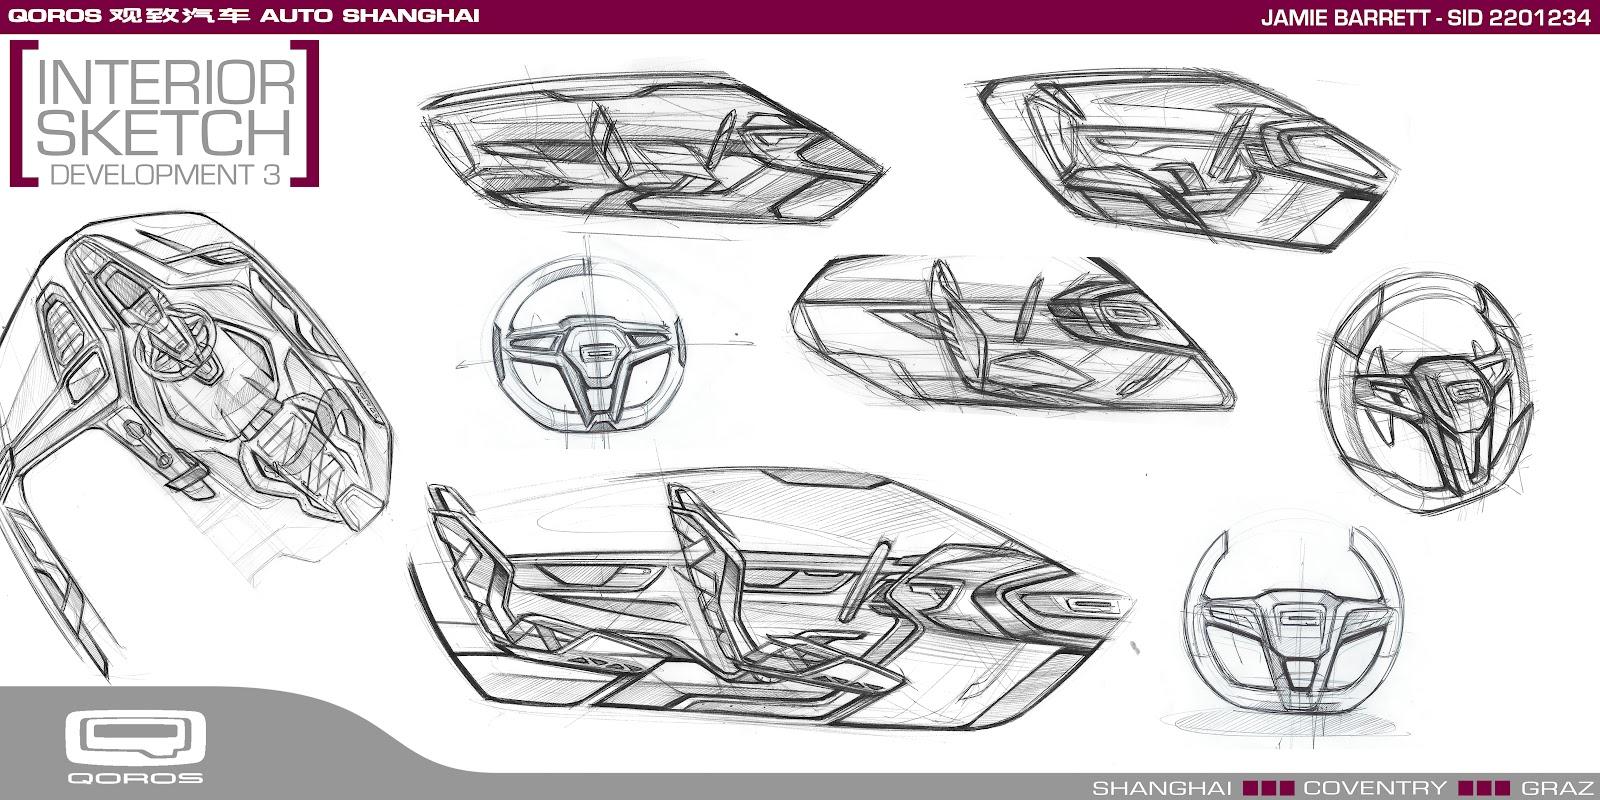 Sketchsite Barrett Qoros Auto Interior Sketch Development